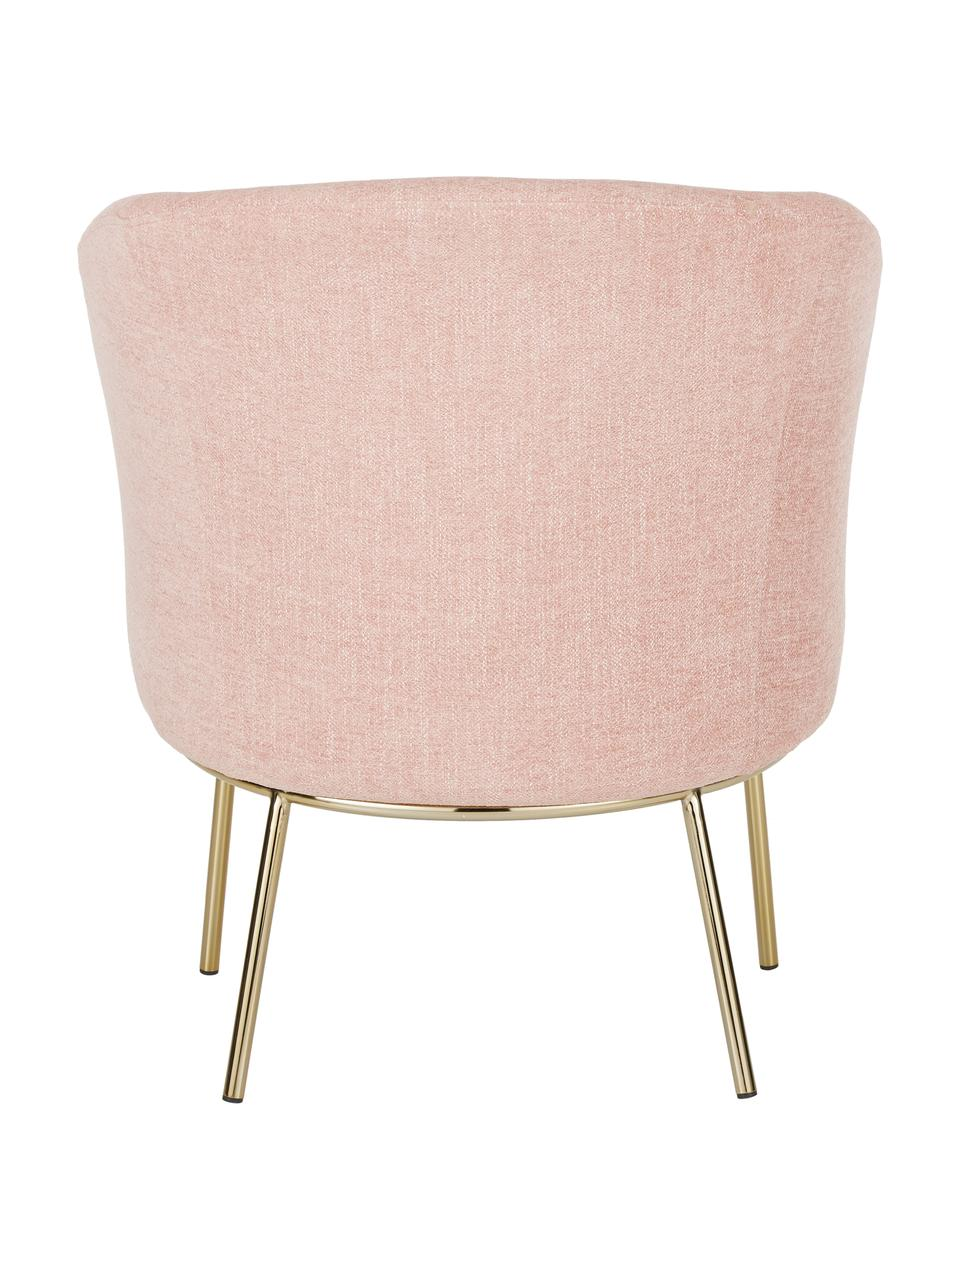 Fauteuil Kylie in roze, Bekleding: polyester, Frame: metaal, multiplex, Poten: gecoat metaal, Geweven stof oudroze, B 77 x D 72 cm